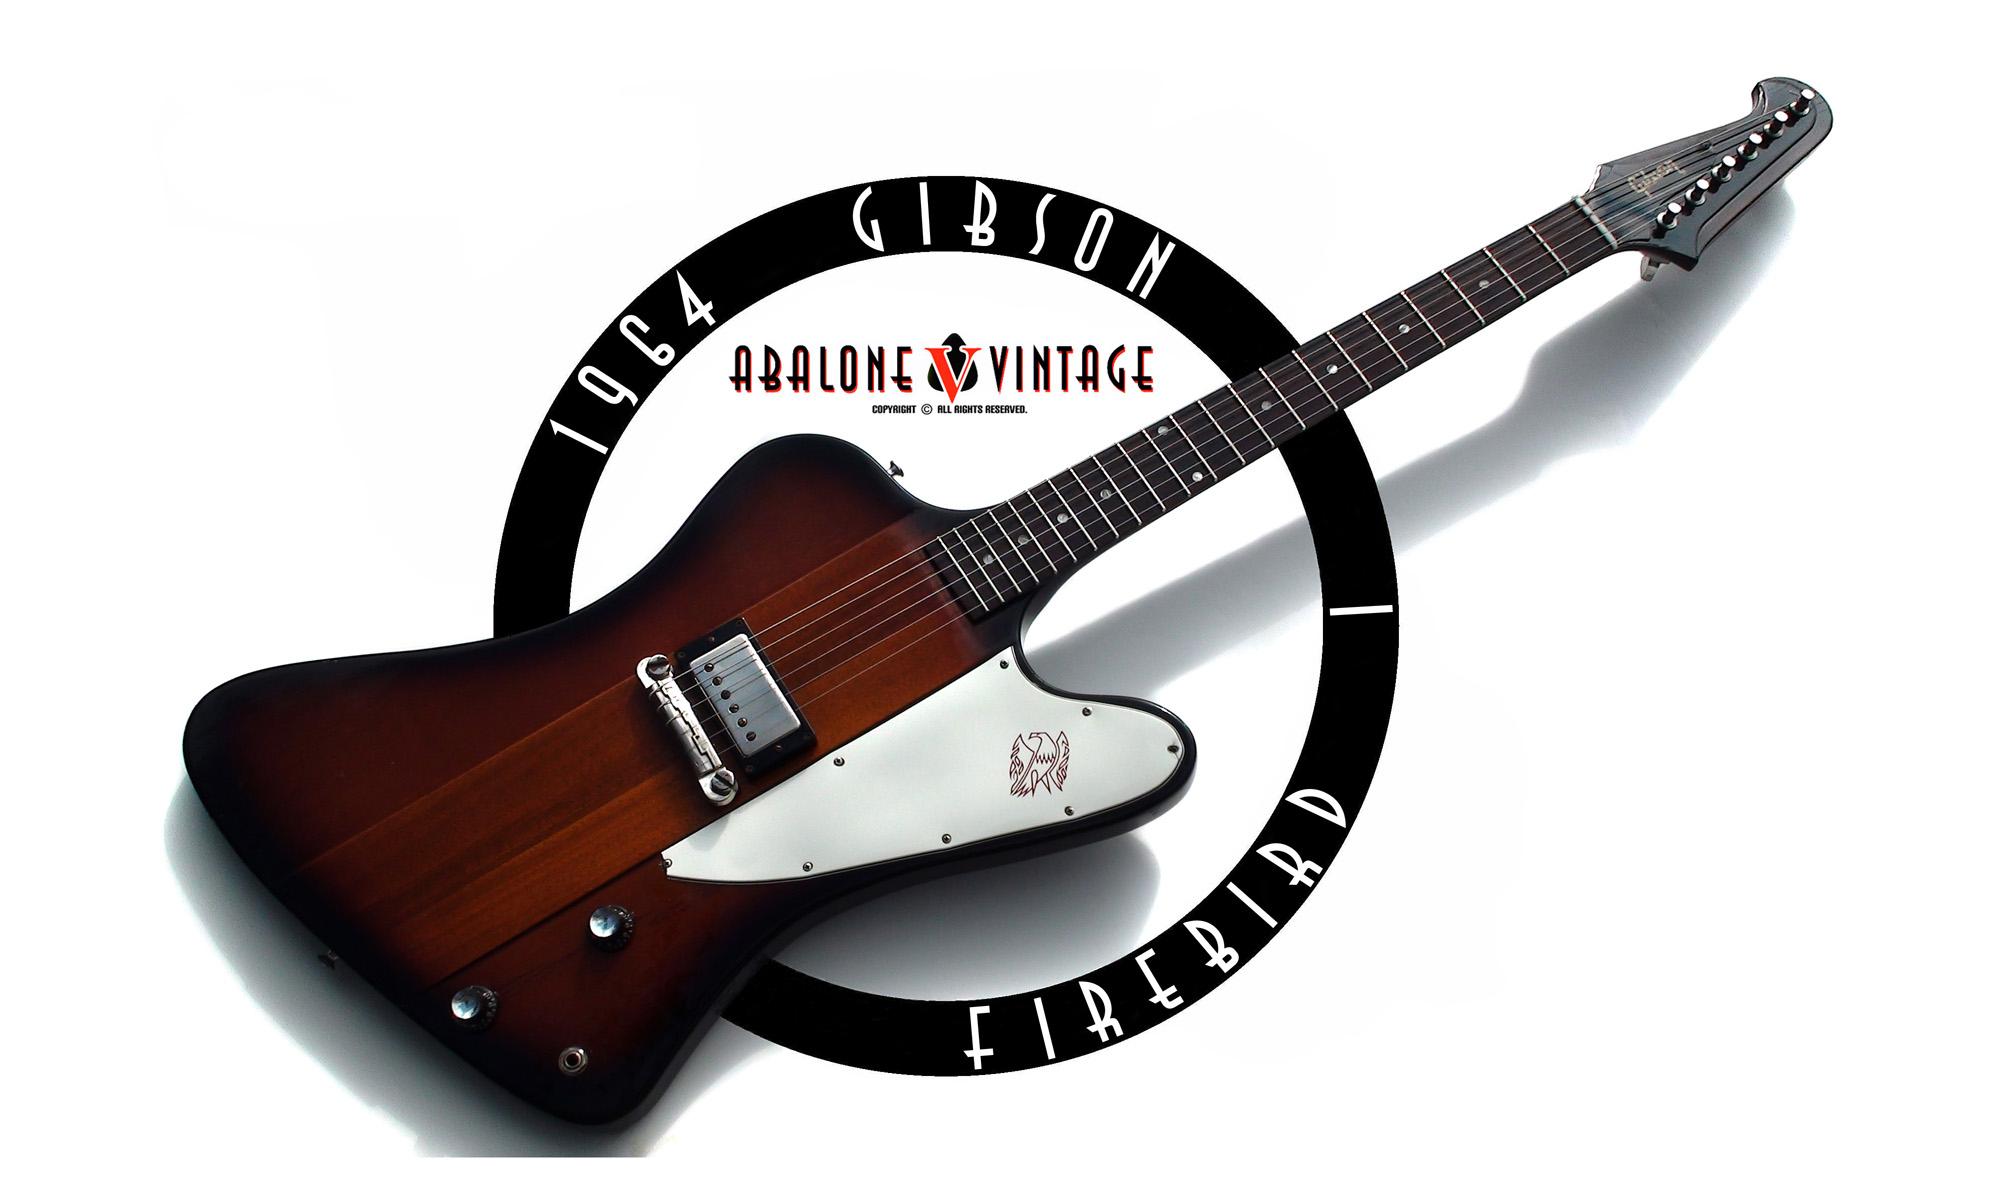 Guitar Wallpapers Gibson Les Paul Fender Stratocaster